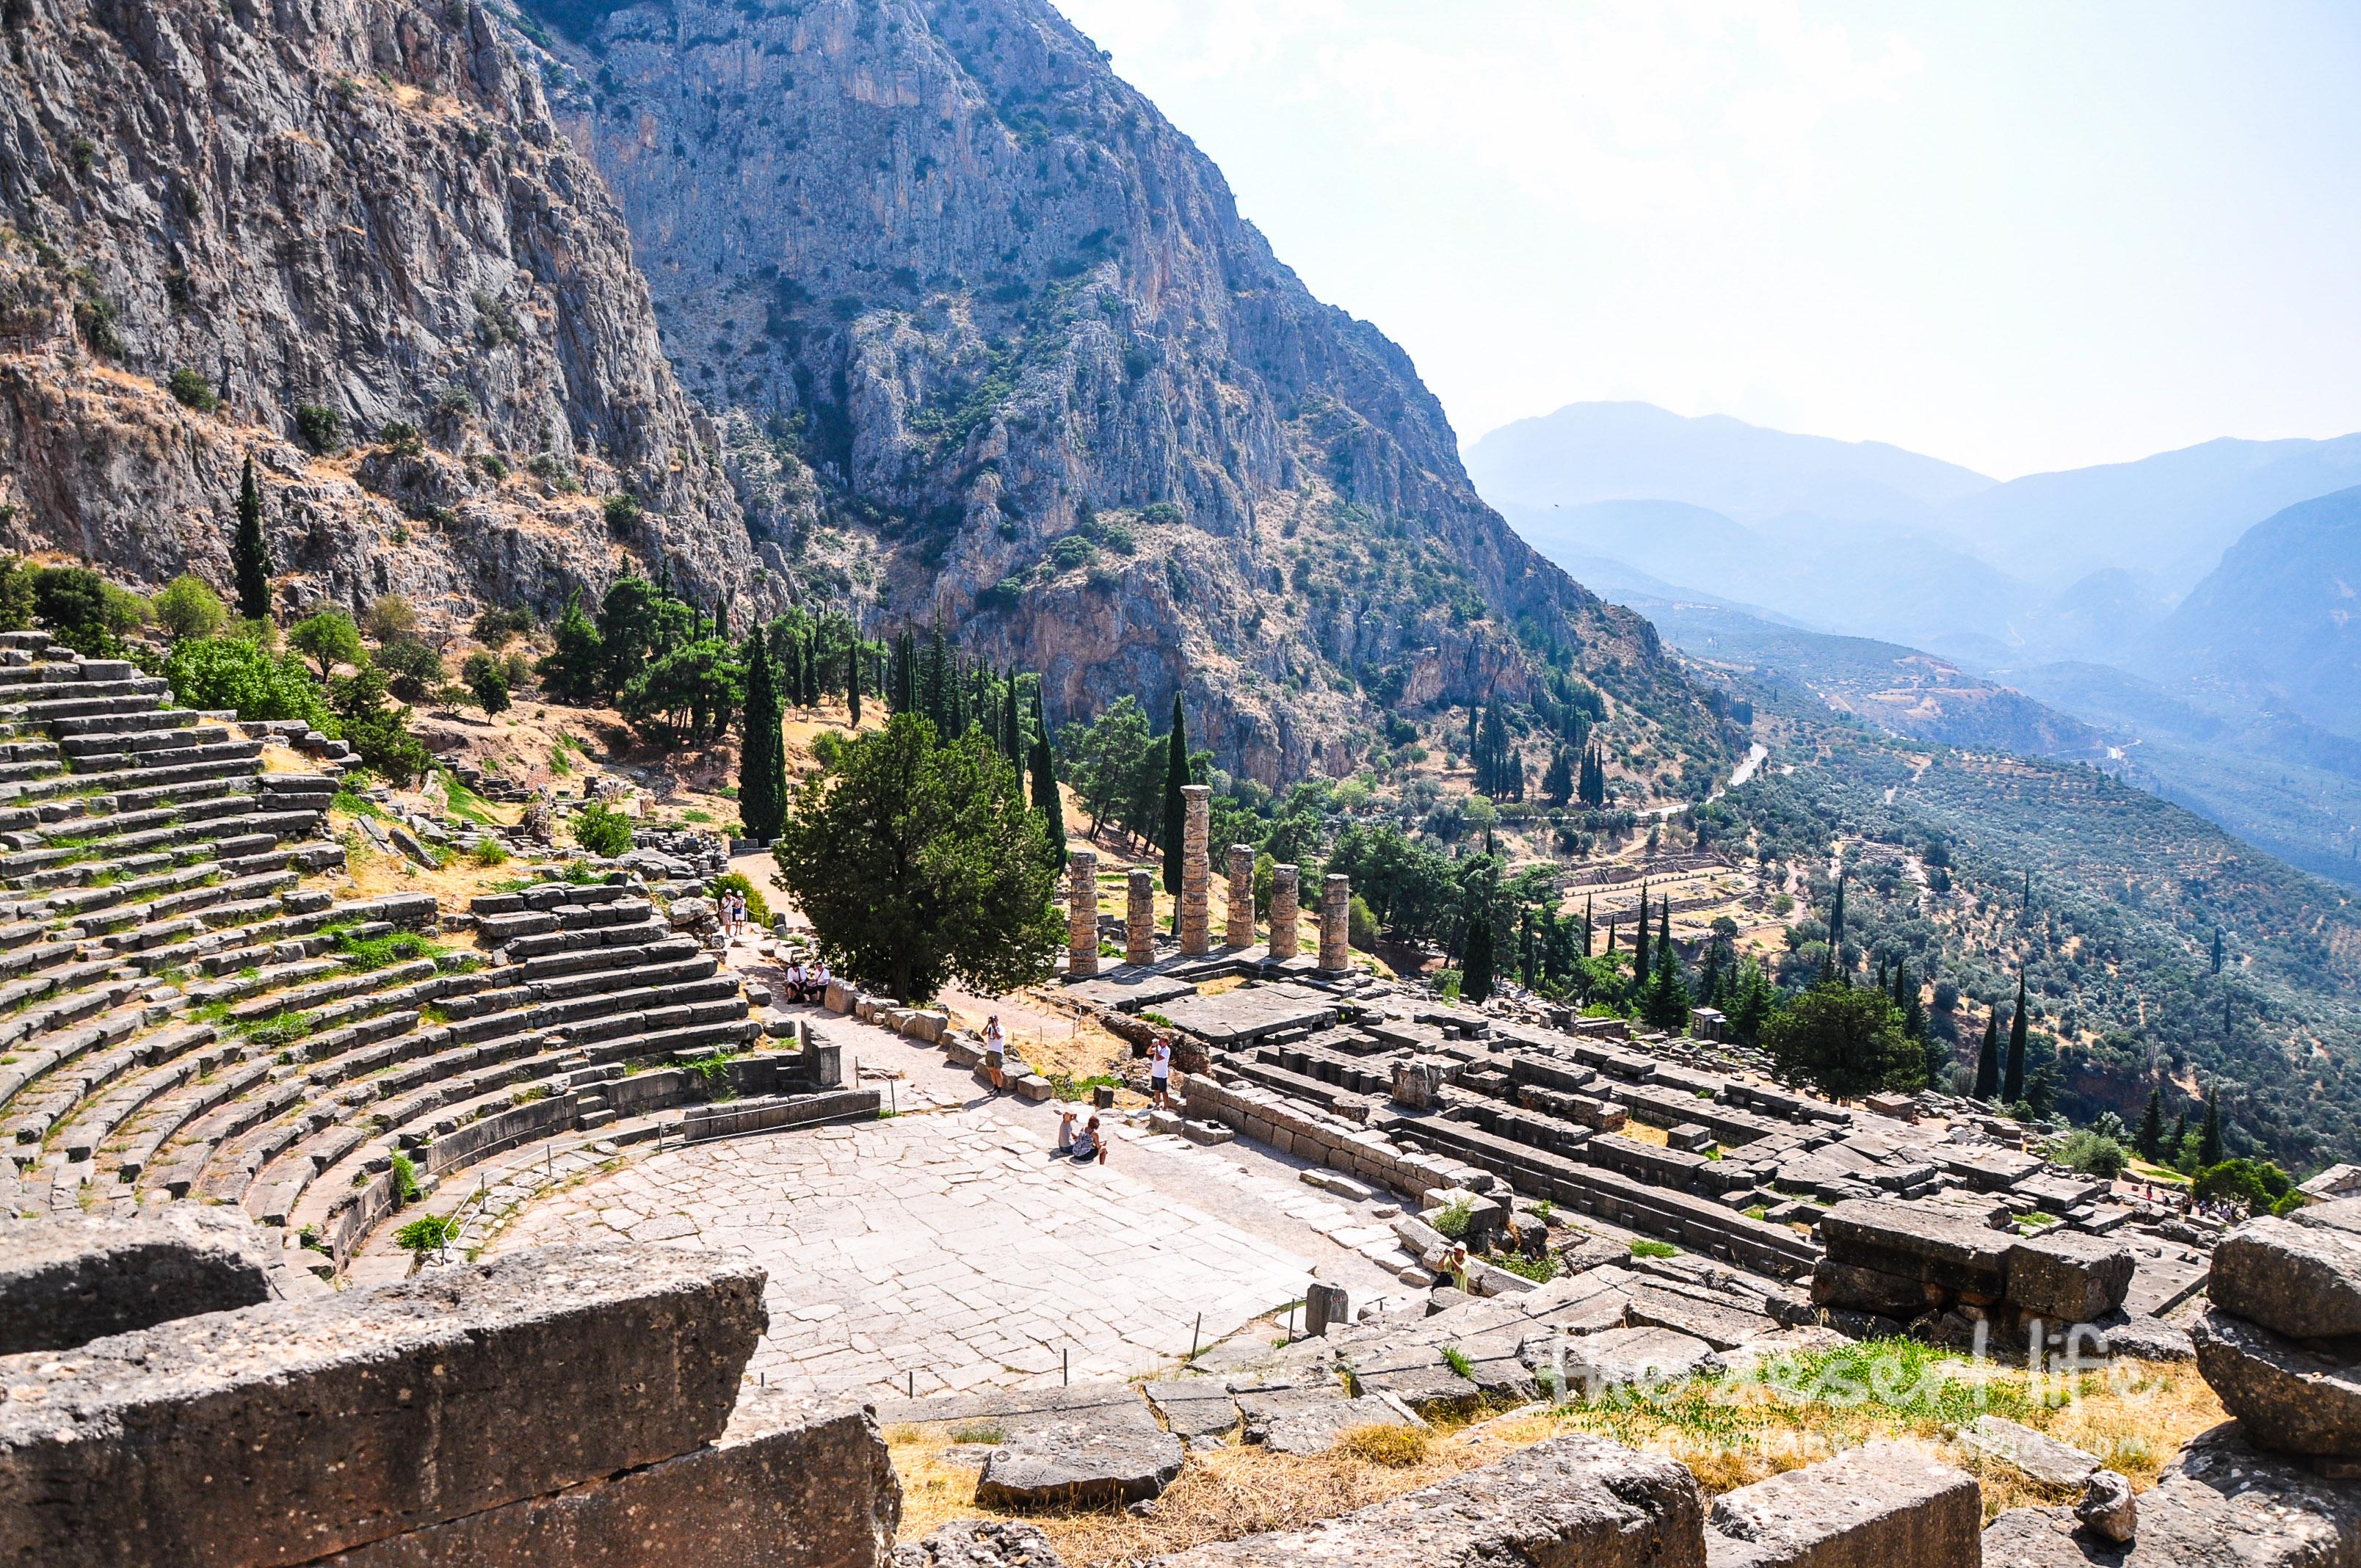 Delphi-Greece Archaeological Site of Delphi